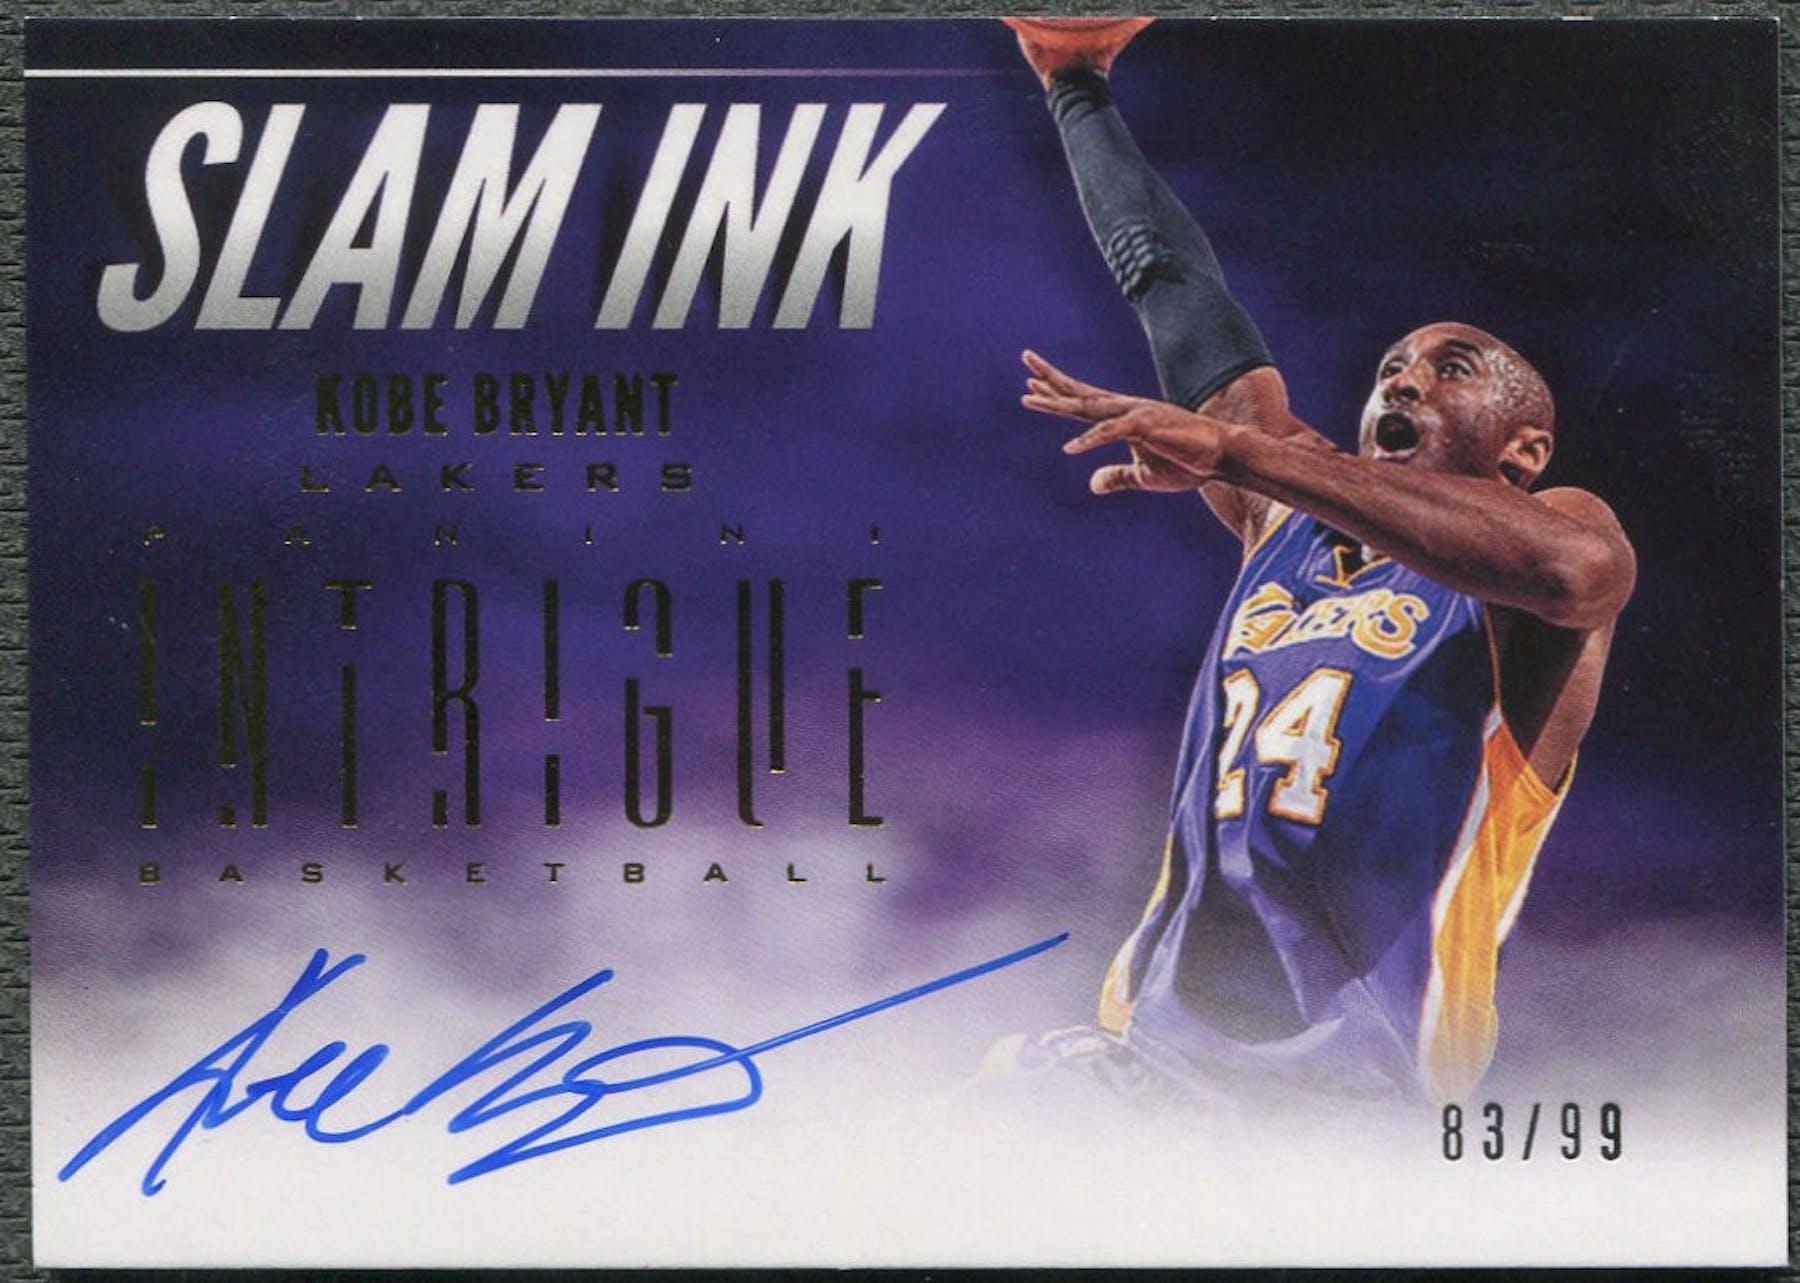 2012 13 Panini Intrigue 3 Kobe Bryant Slam Ink Auto 83 99